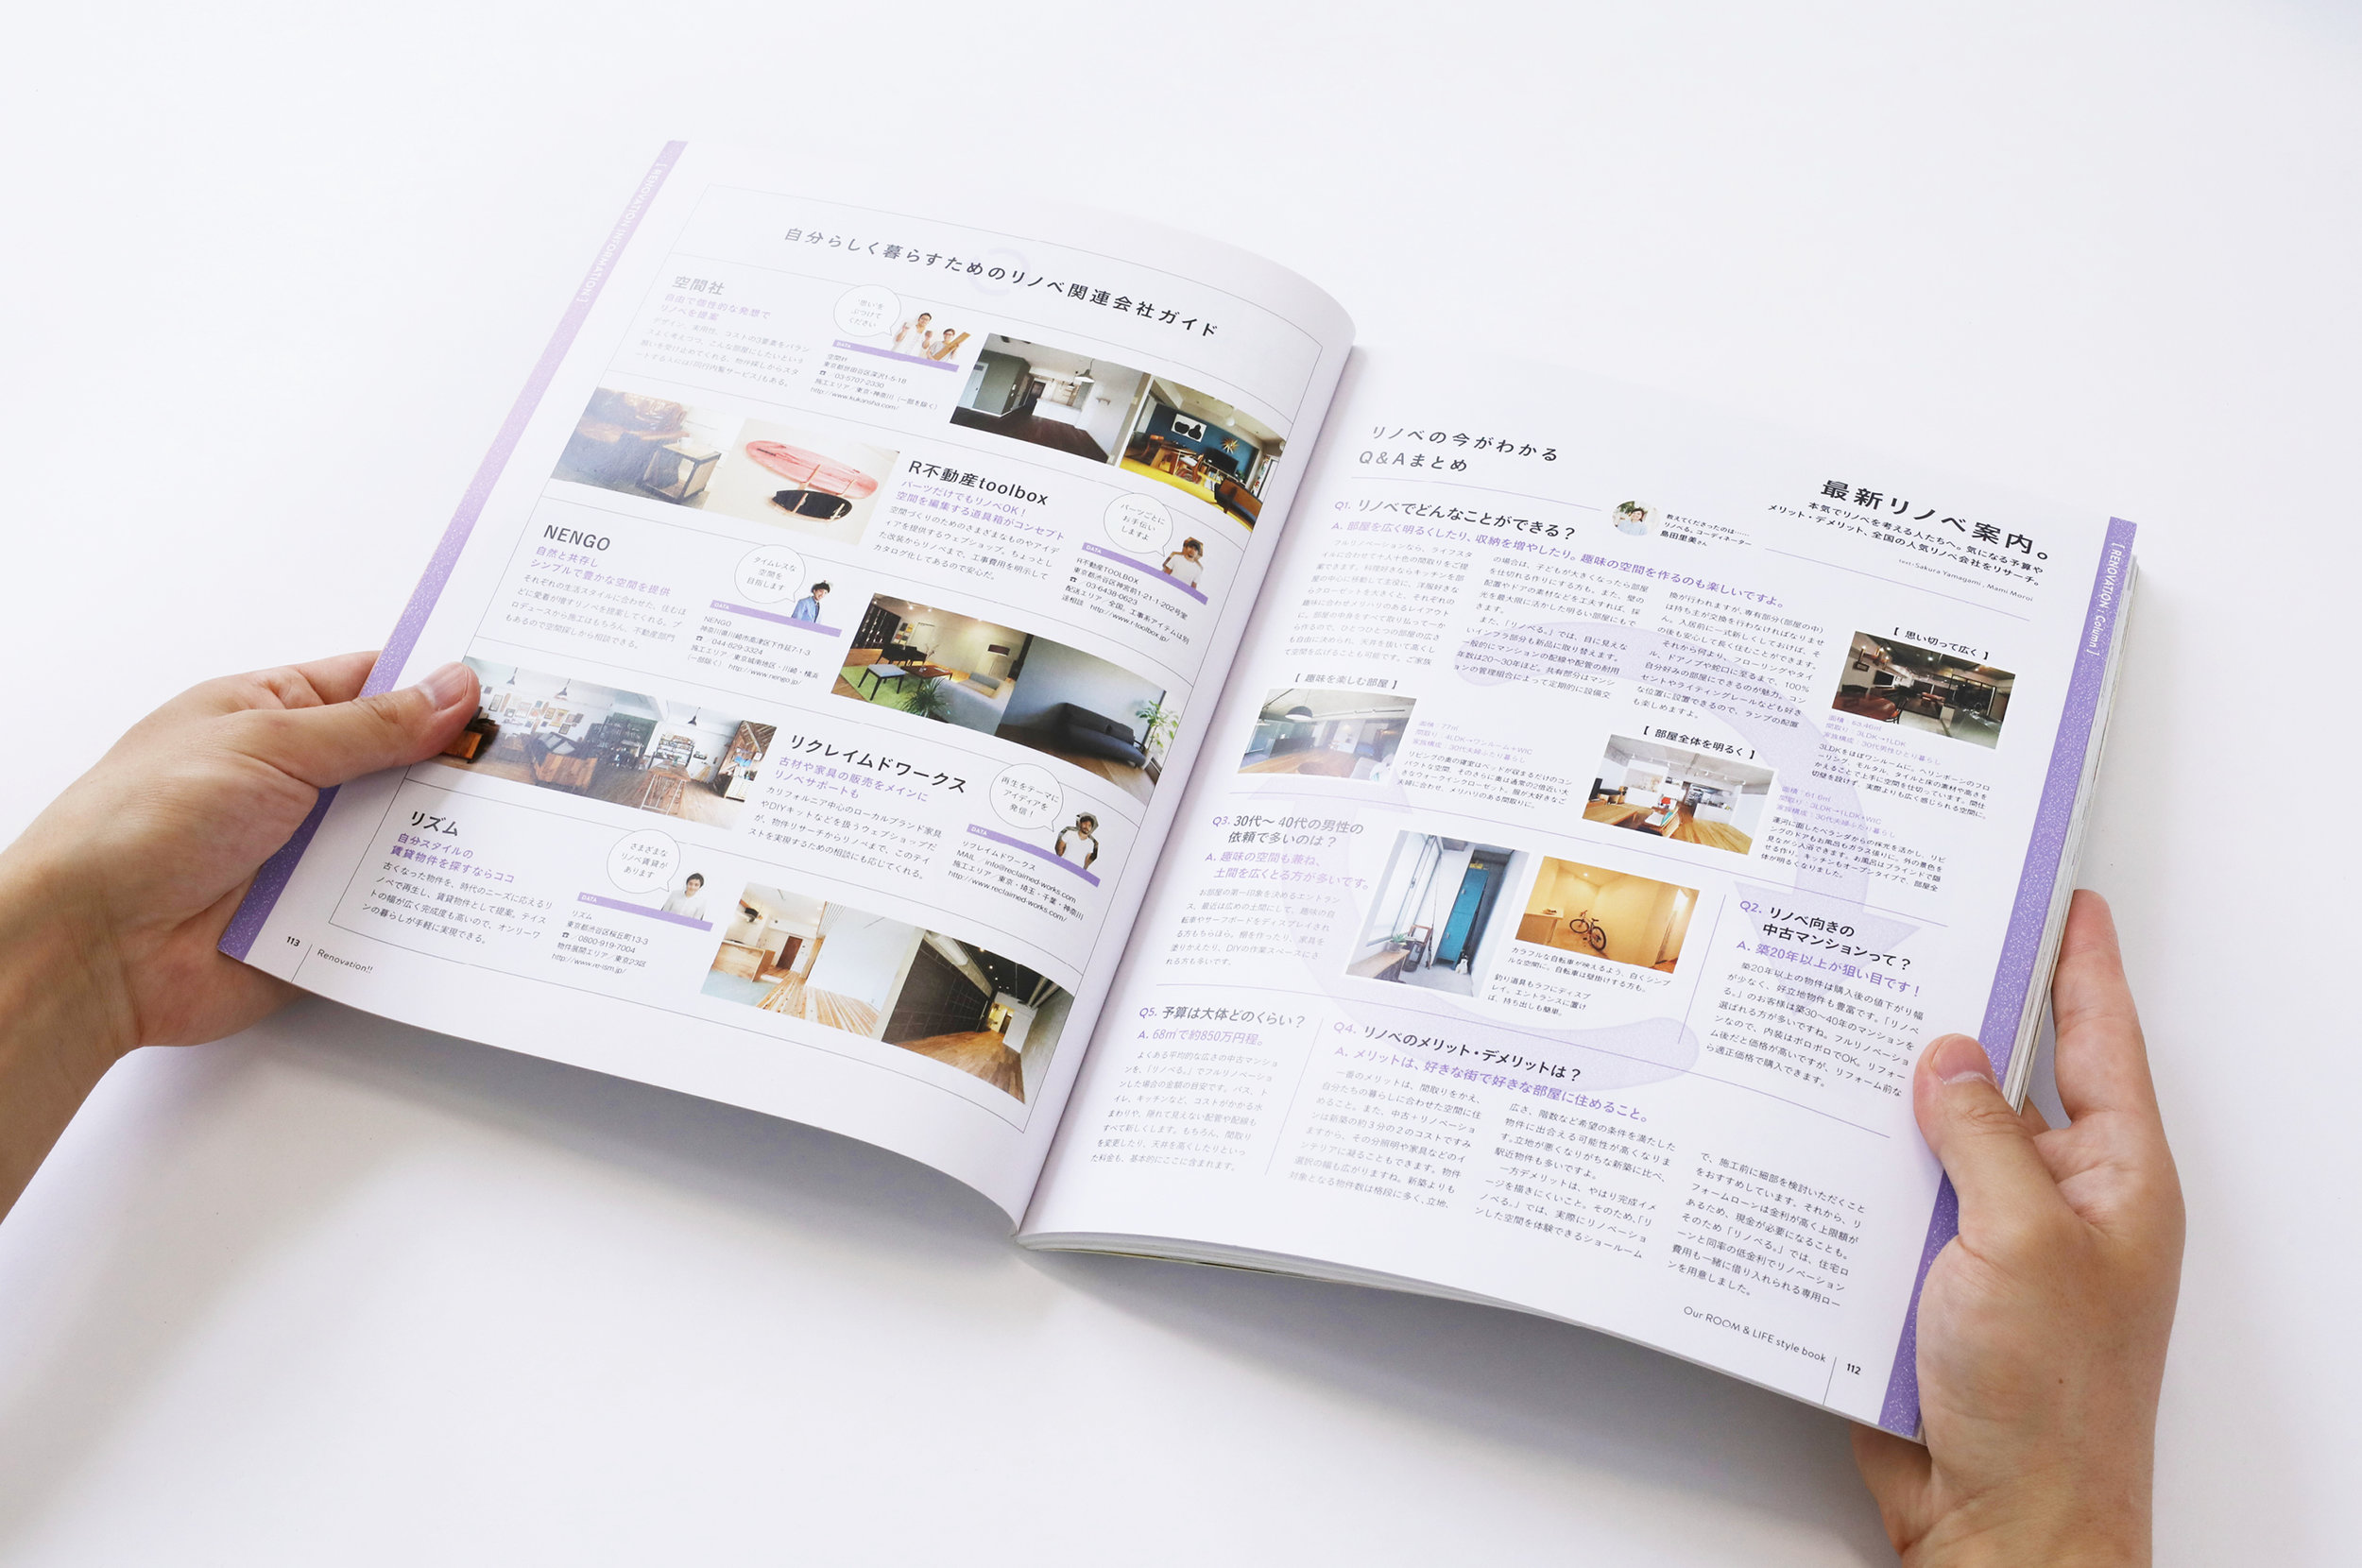 stylebook32.jpg